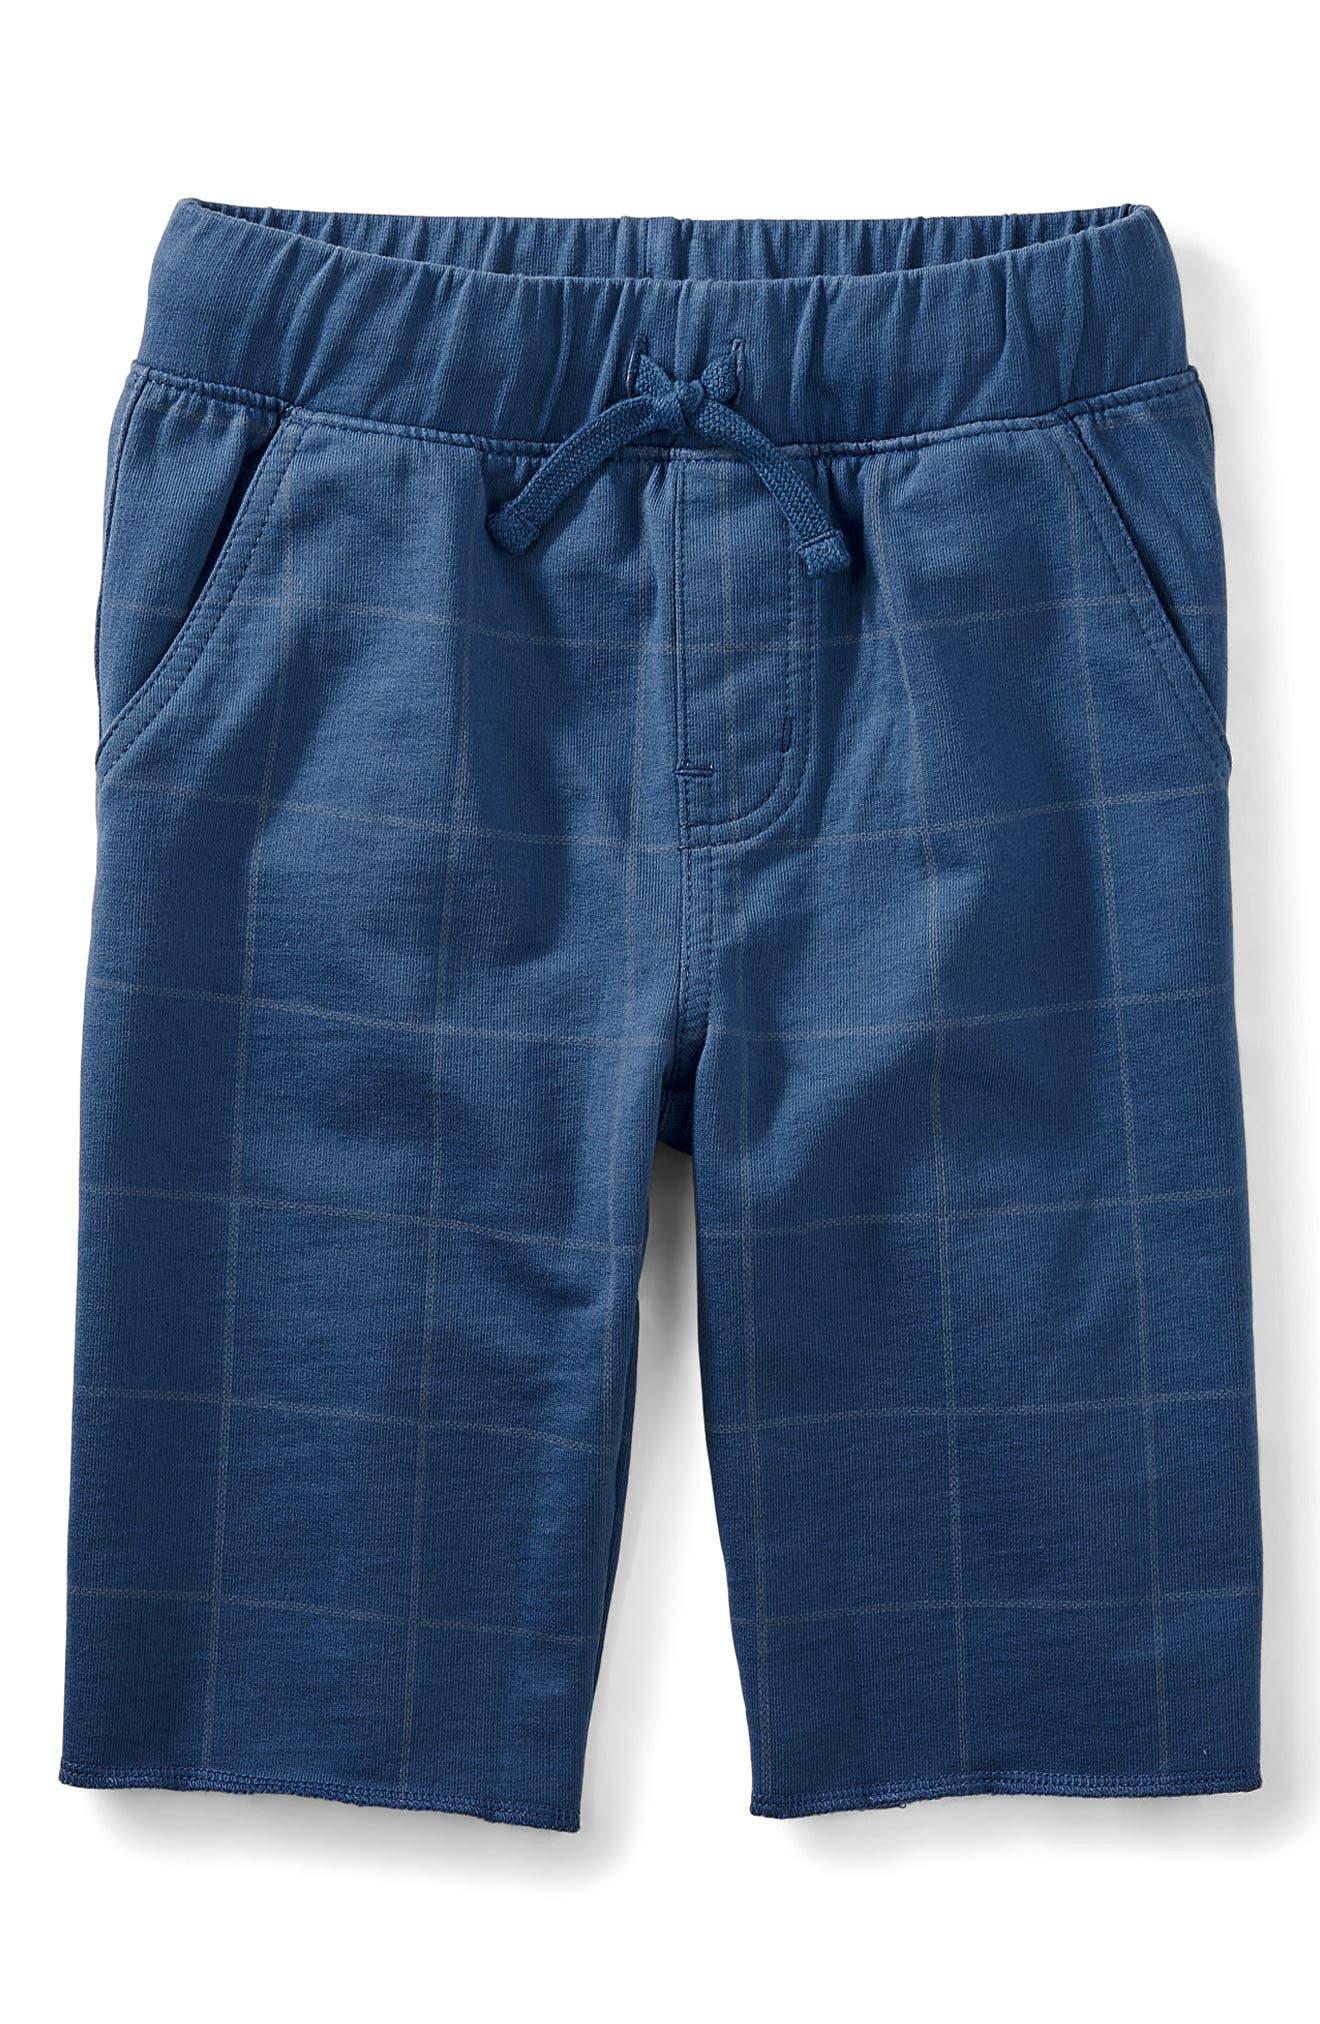 Cruiser Print Shorts,                         Main,                         color, Cobalt Windowpane